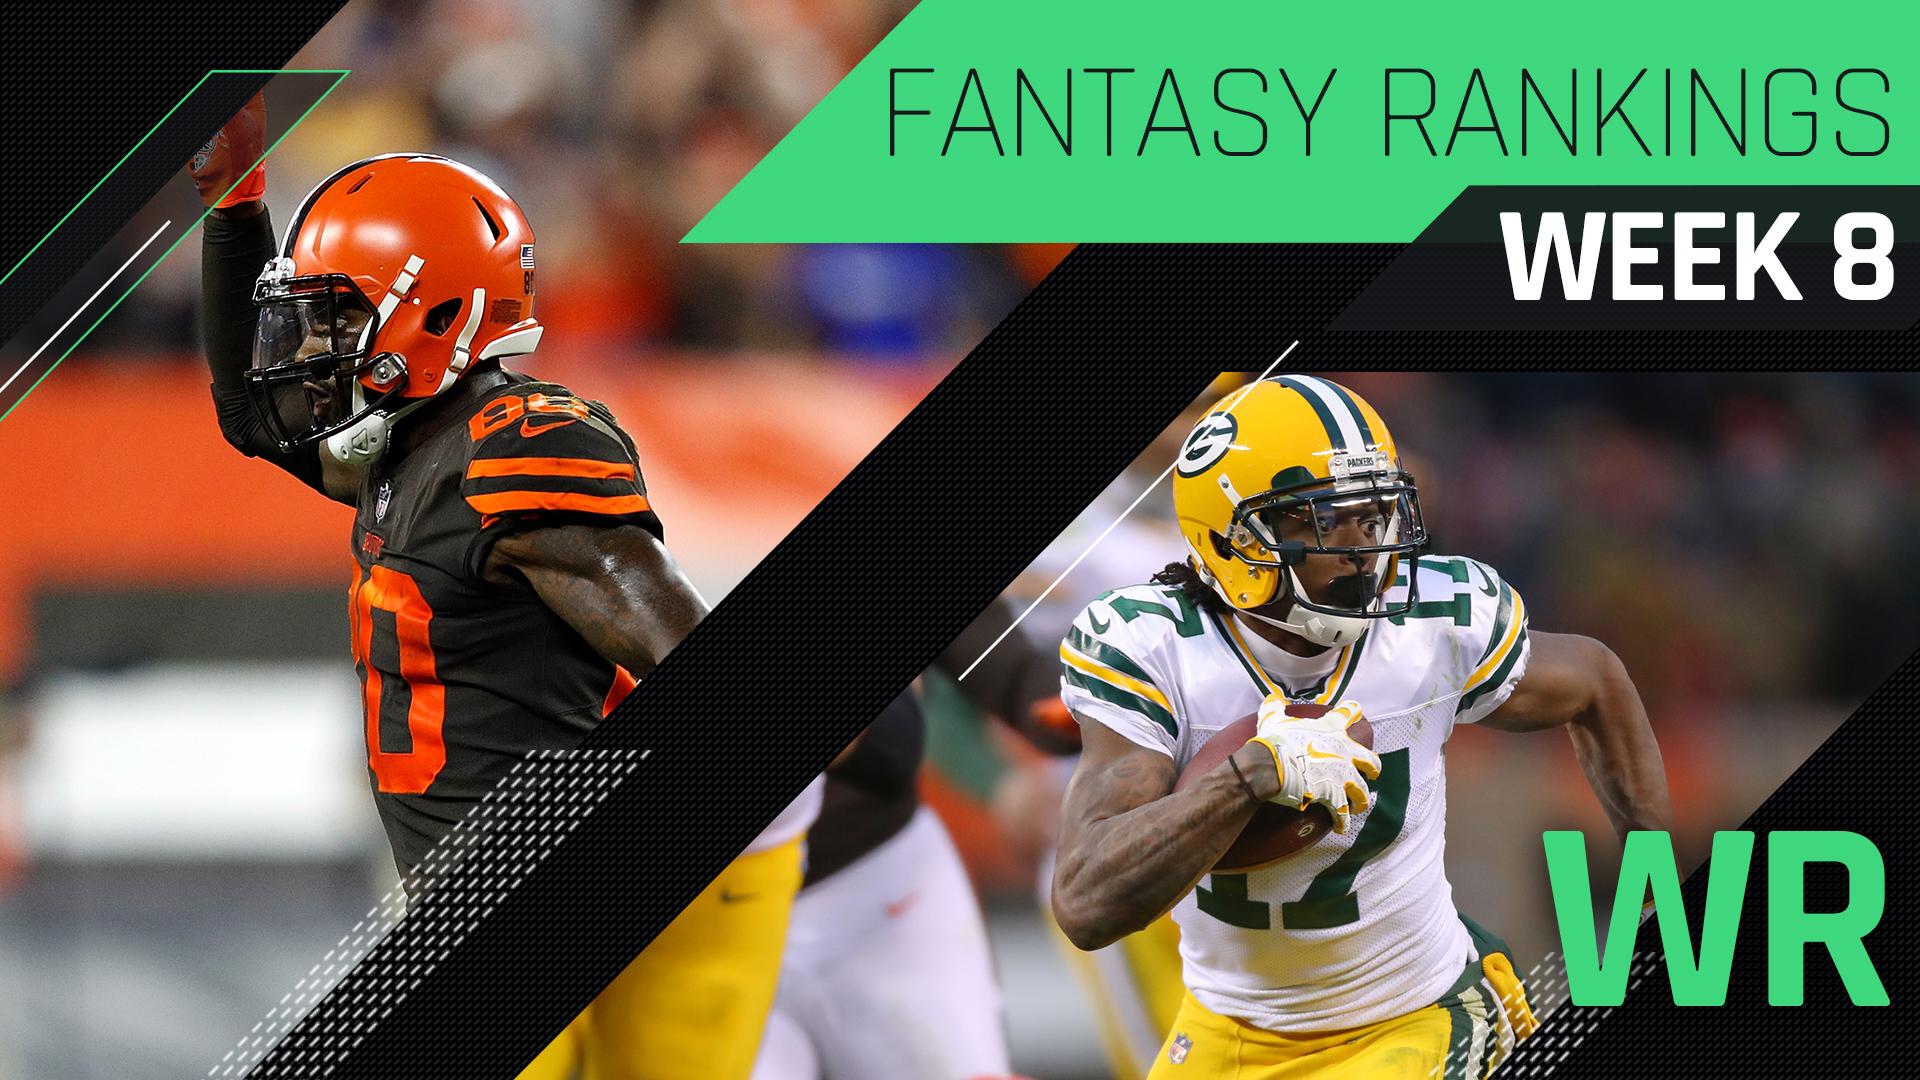 fbc6d9a94cf Week 8 Fantasy Rankings: WR | Sporting News